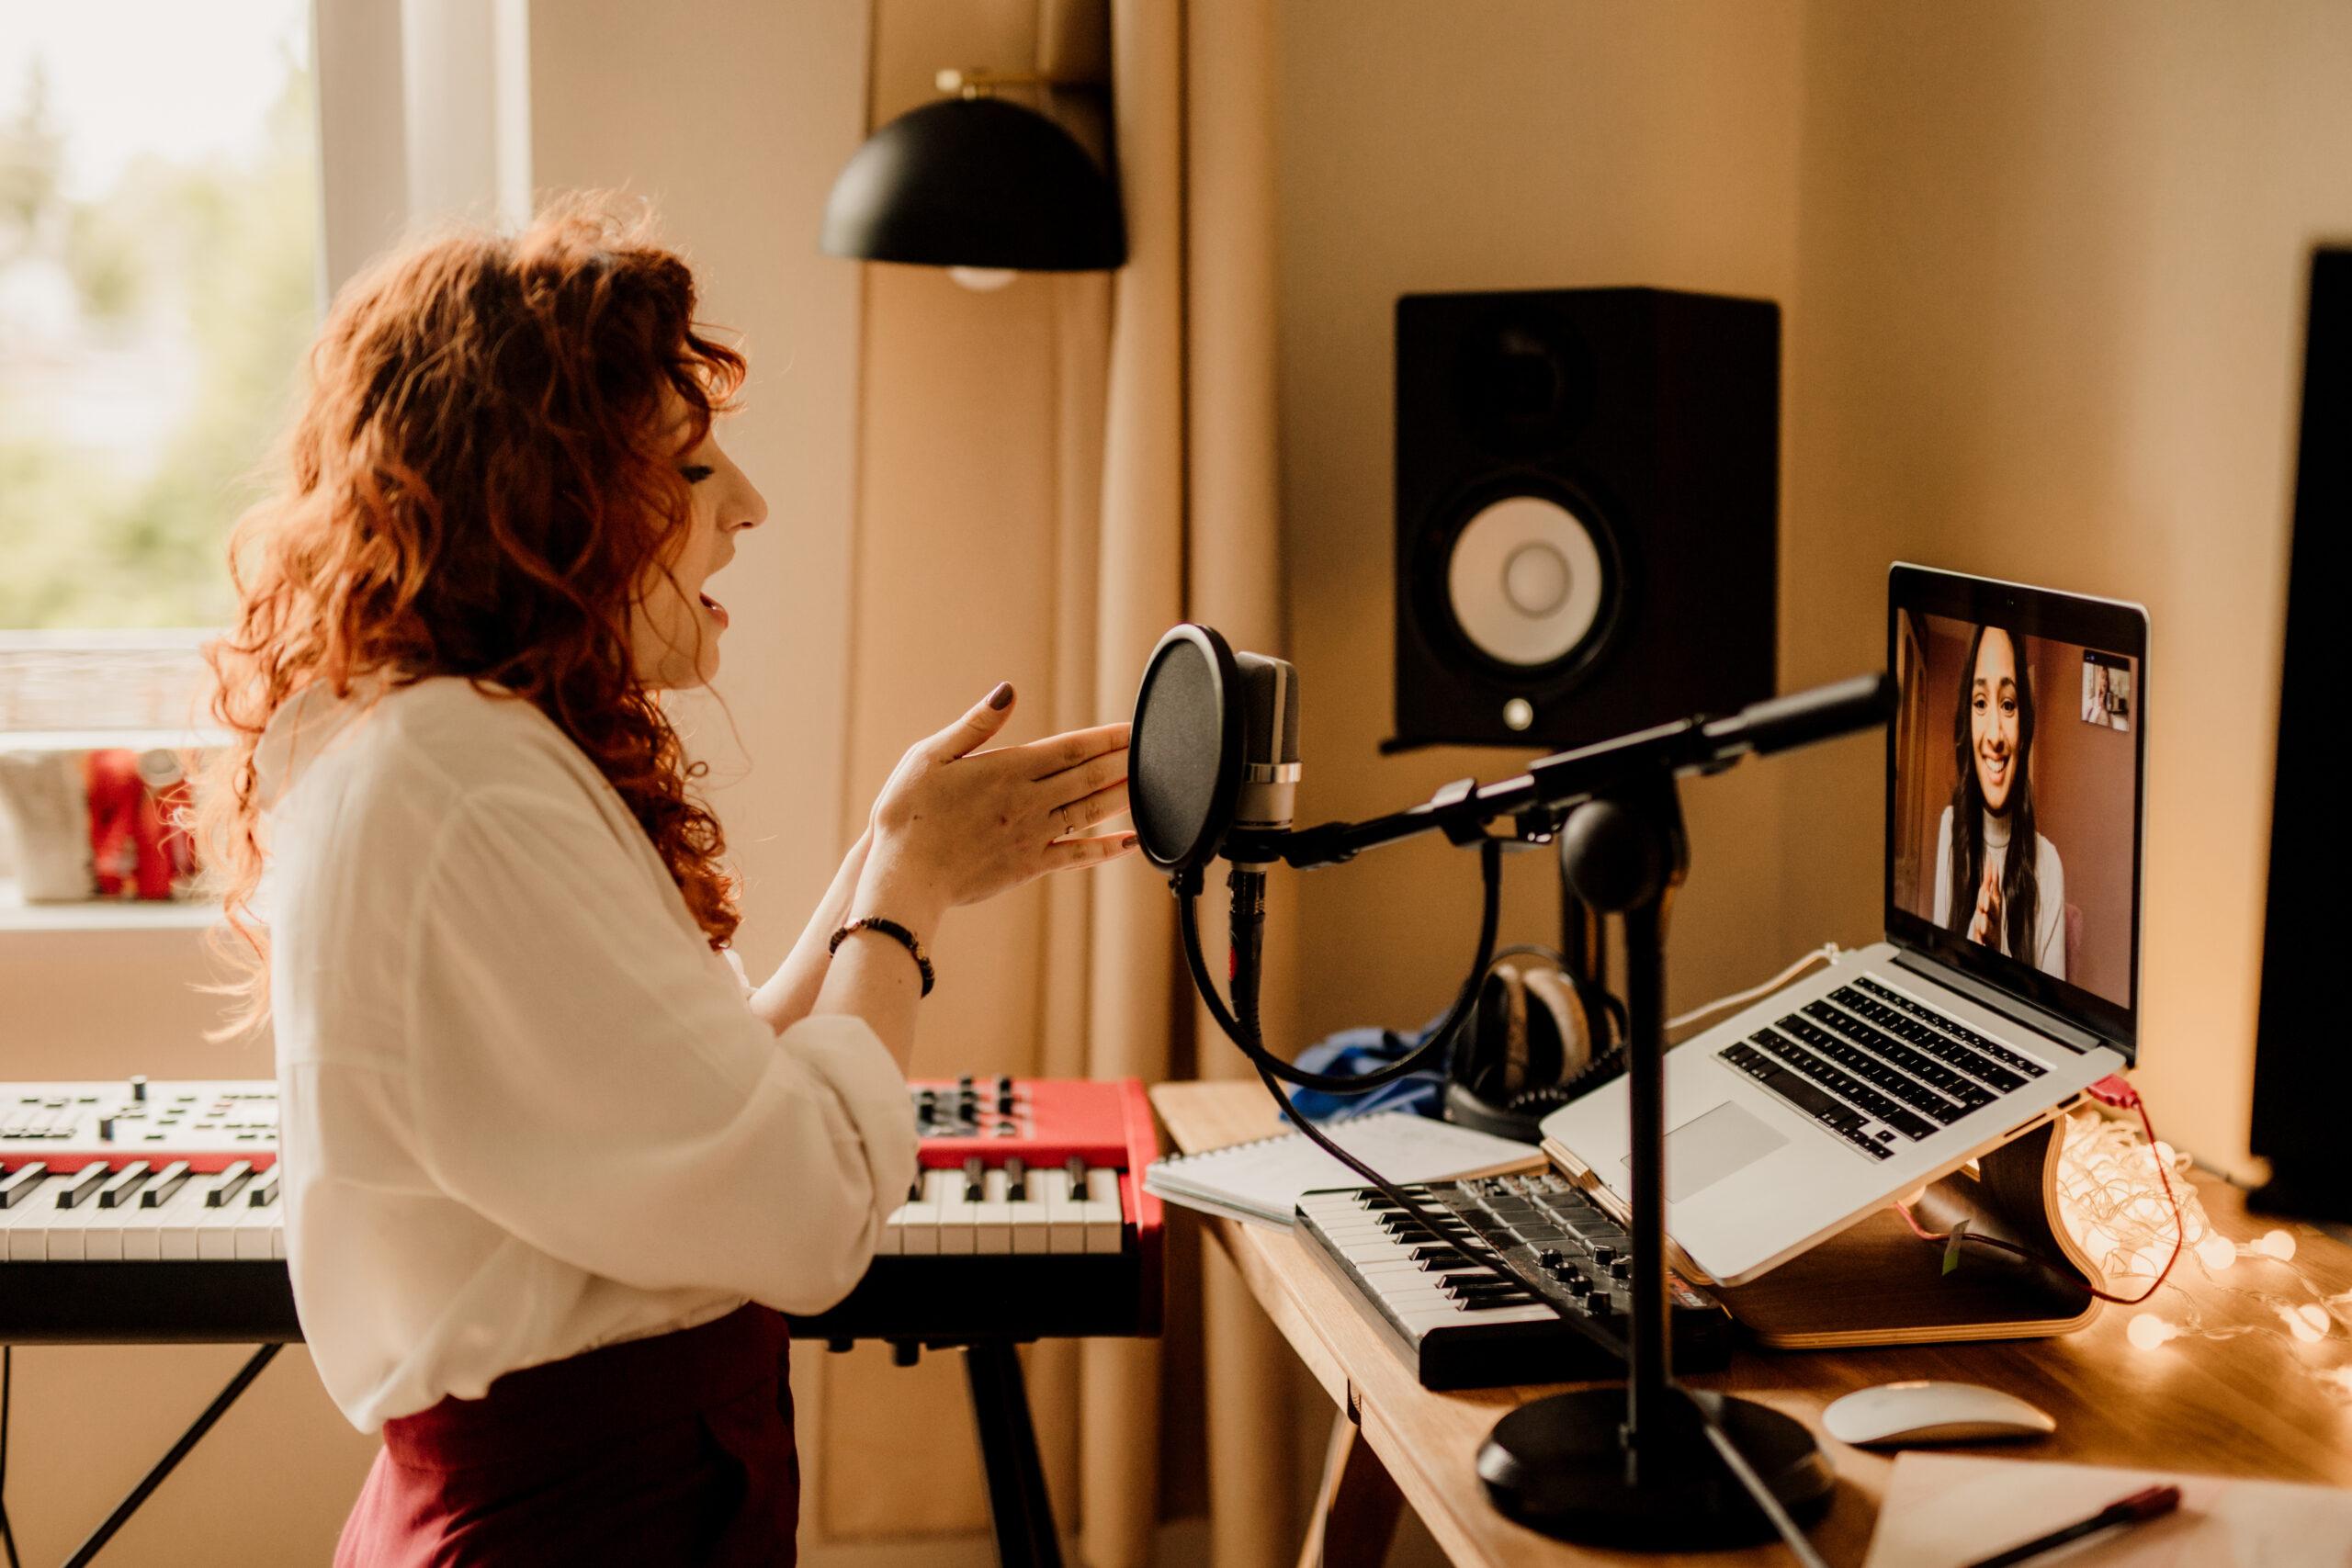 Estill singing teacher, Aleksandra Vocal Coach, giving a singing lesson online to a female student.